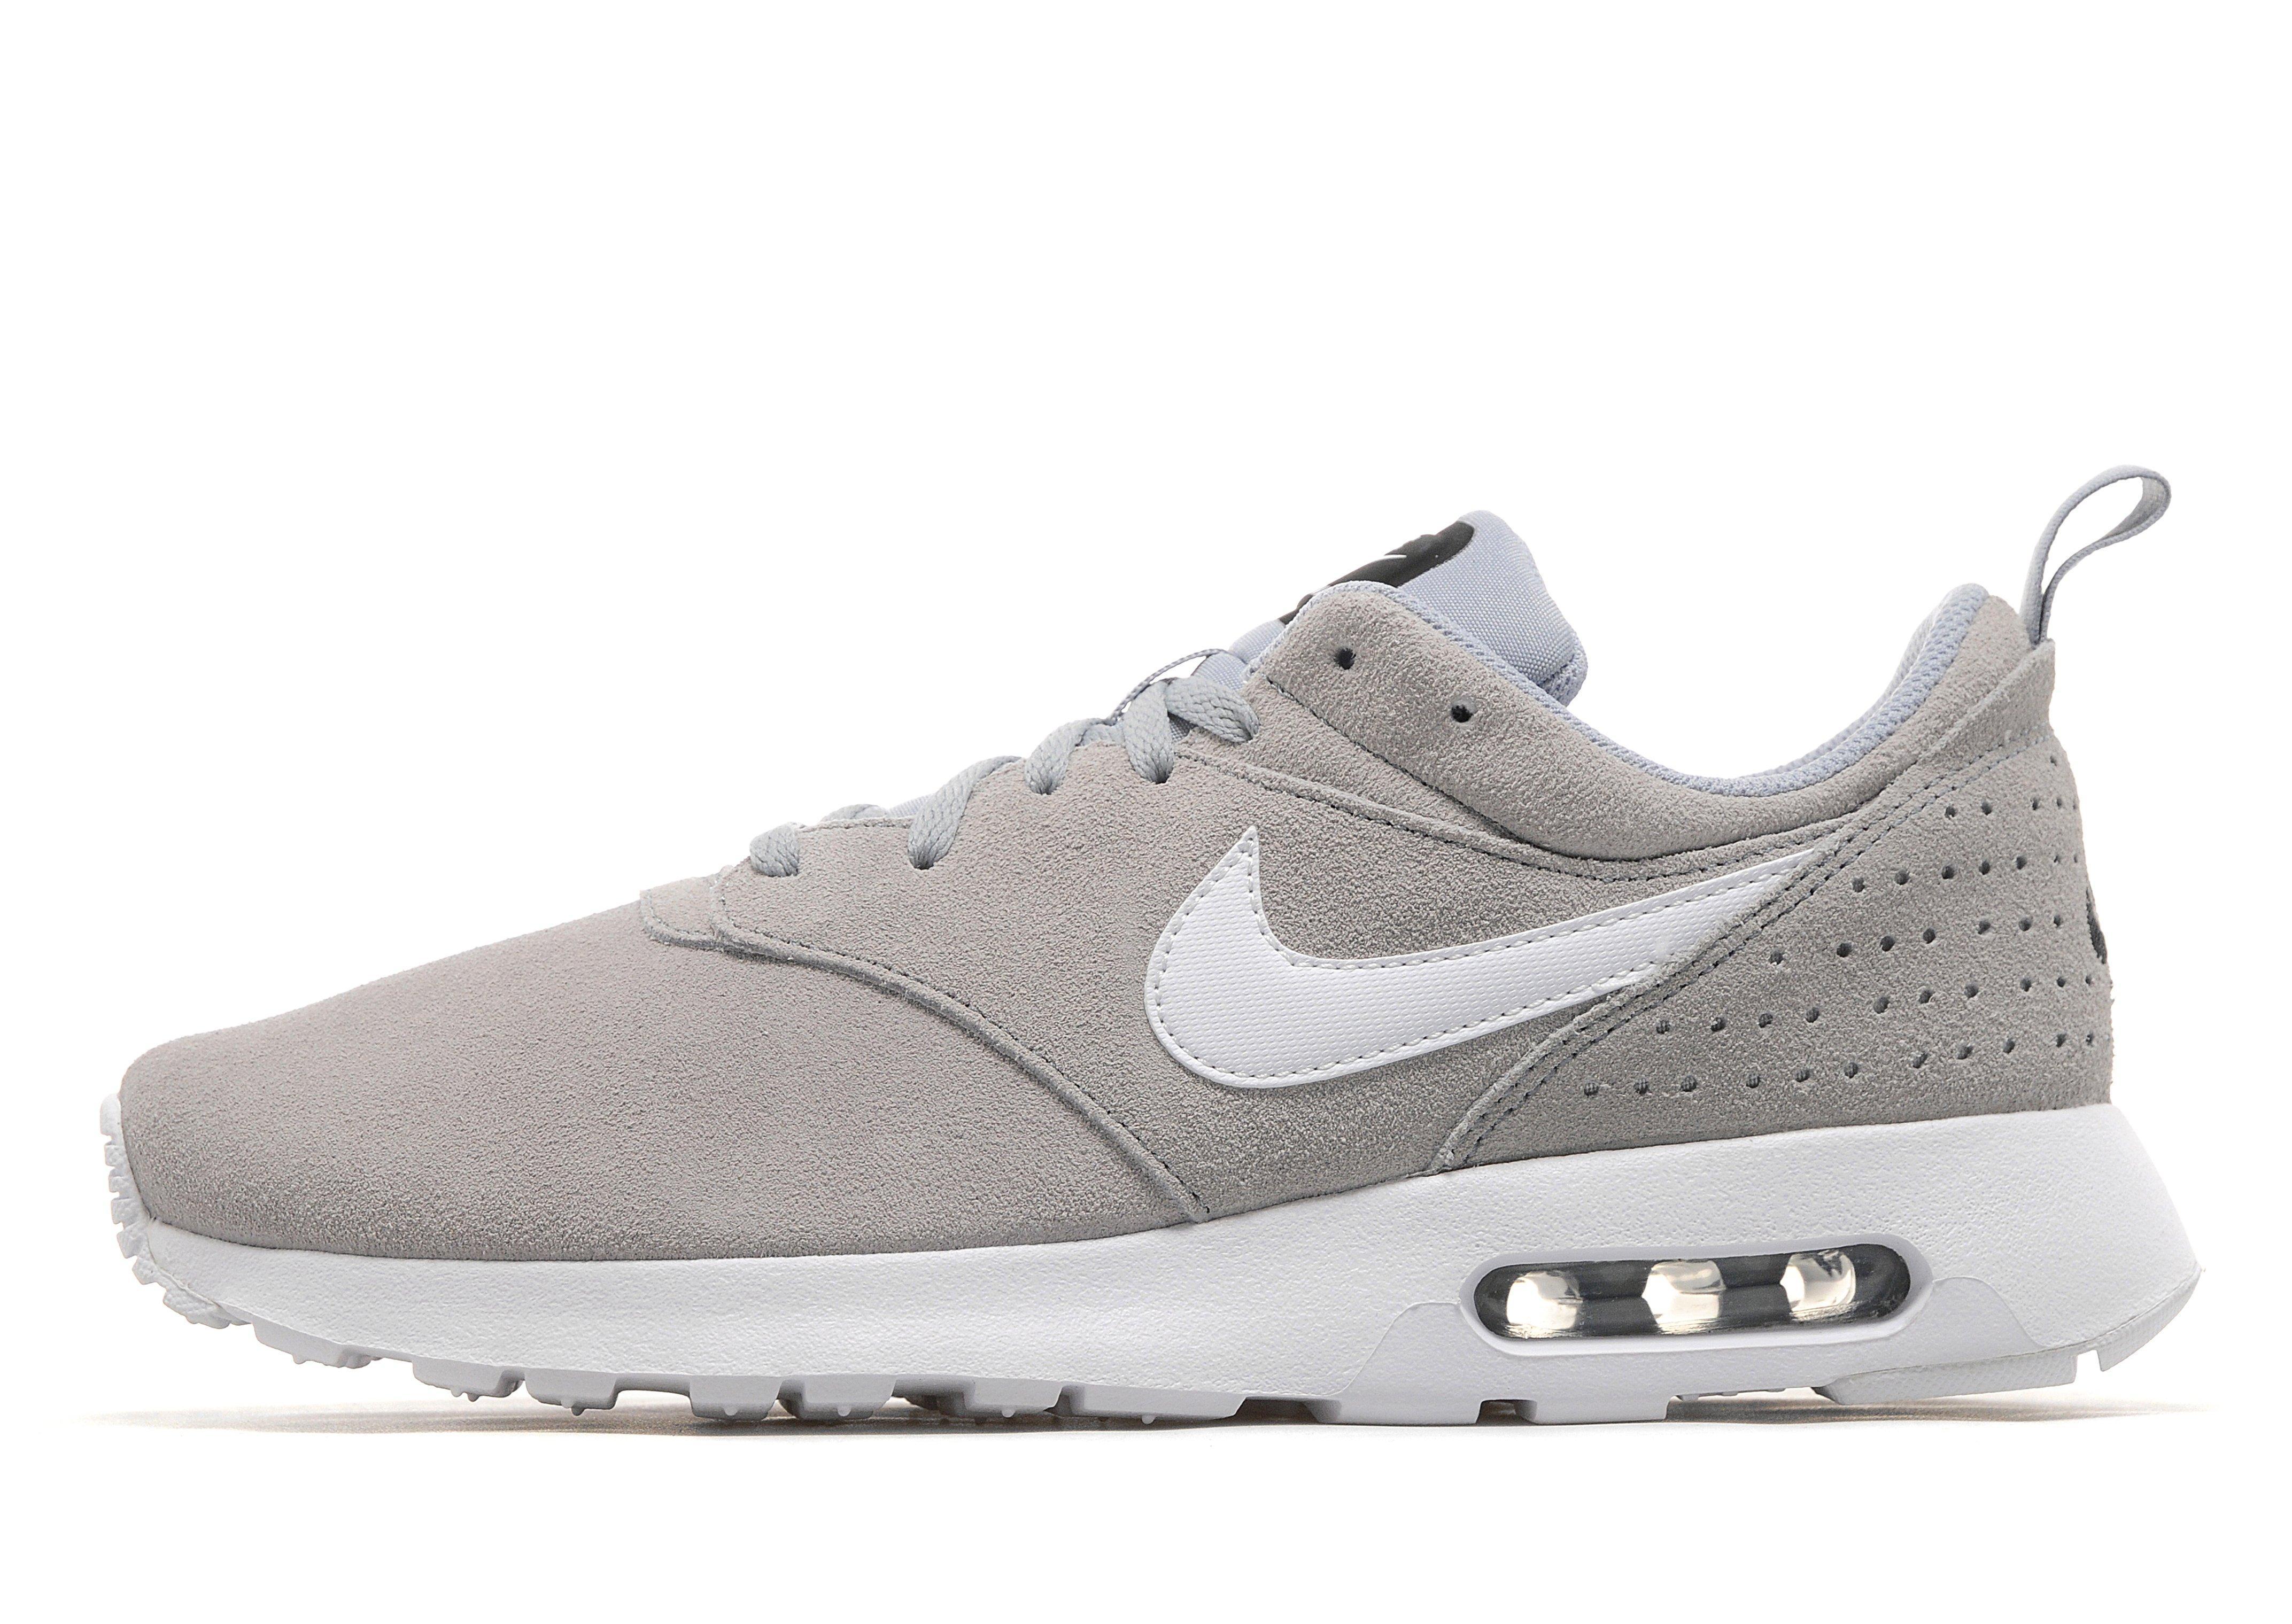 Nike Air Max Tavas Grey Suede